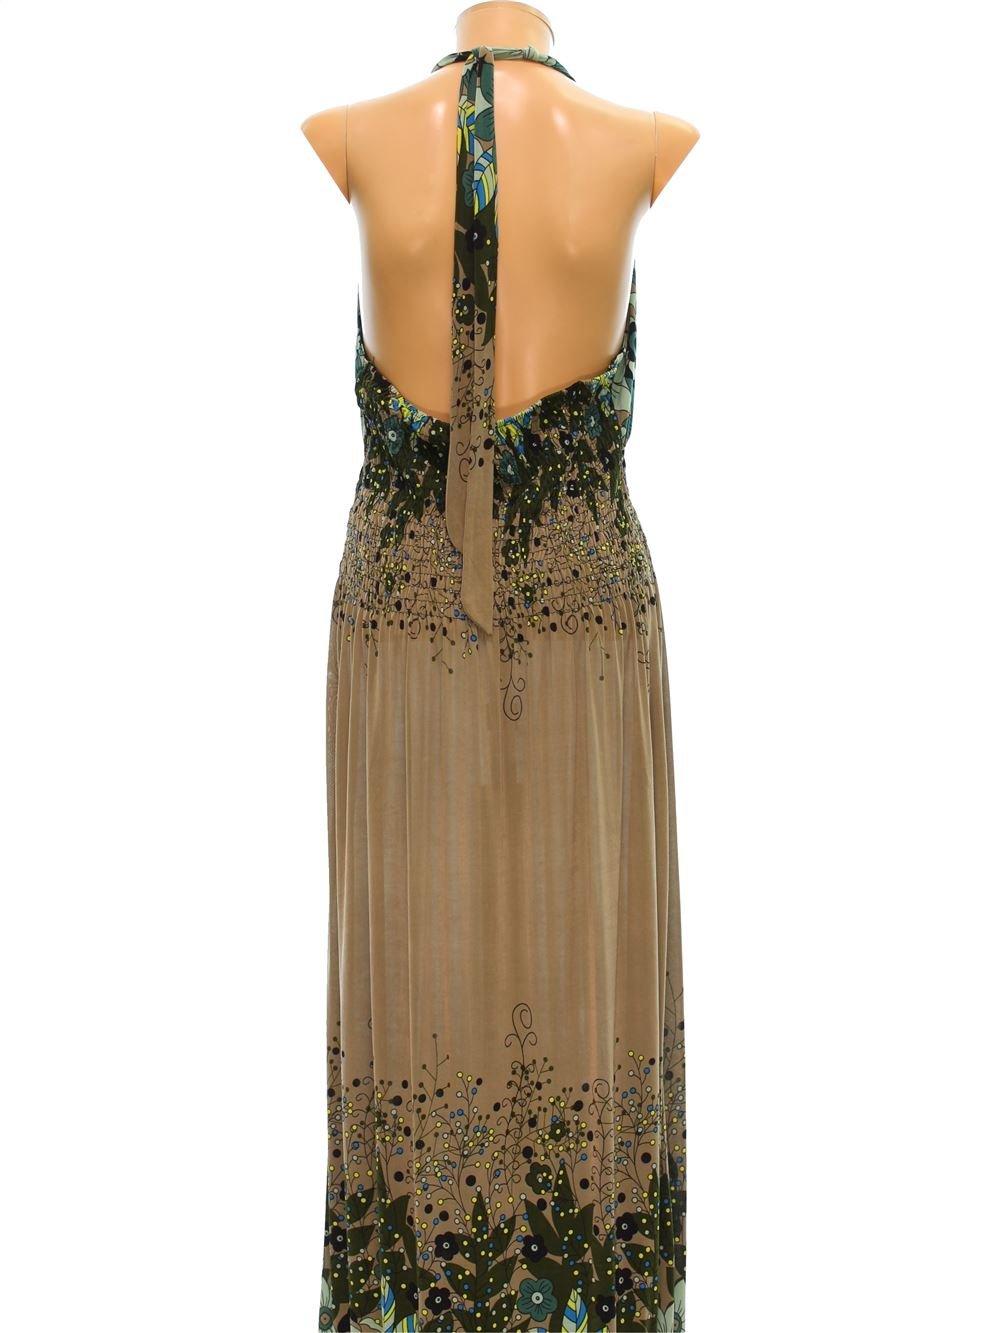 Robe Femme €1513386 99 Pas Amparo Xl Cher7 80nwkOPX